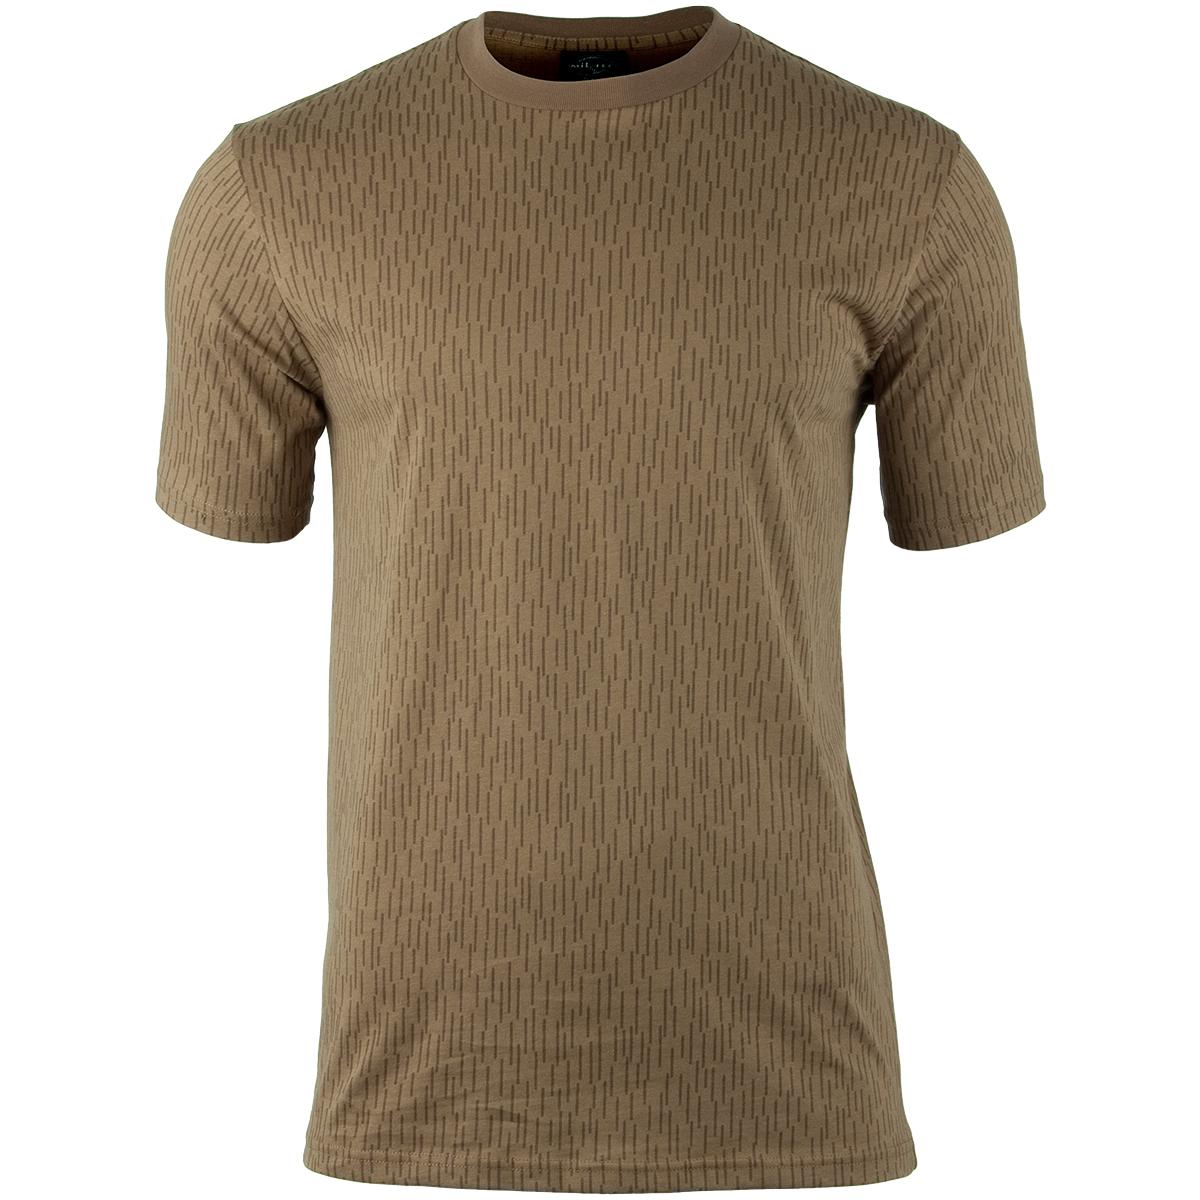 East German Nva Army T Shirt Strichtarn Camo